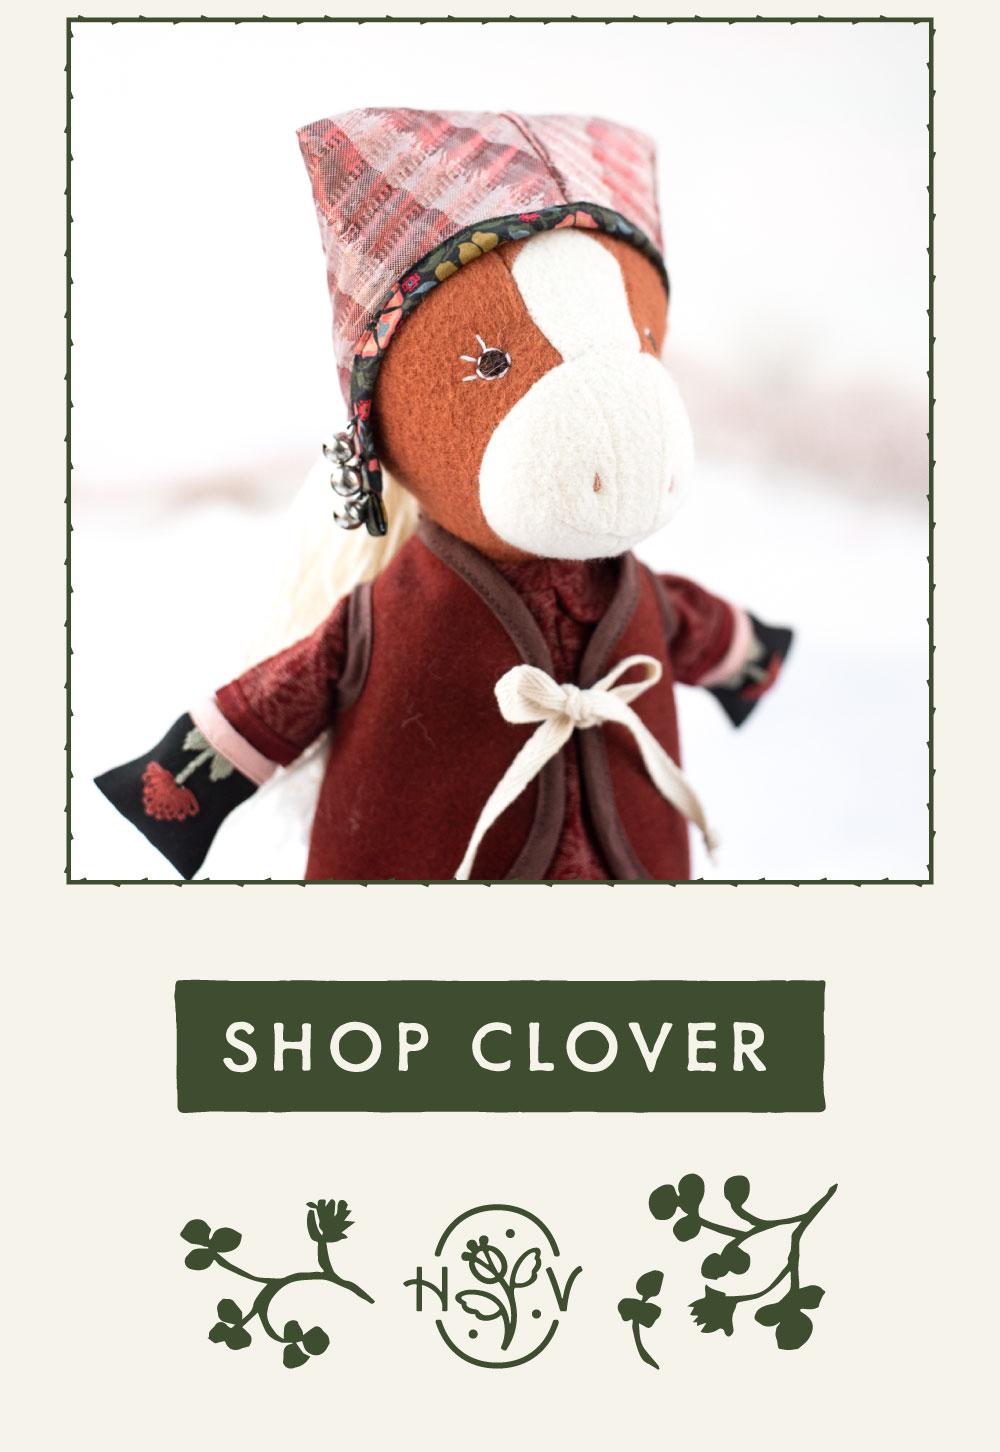 shop clover